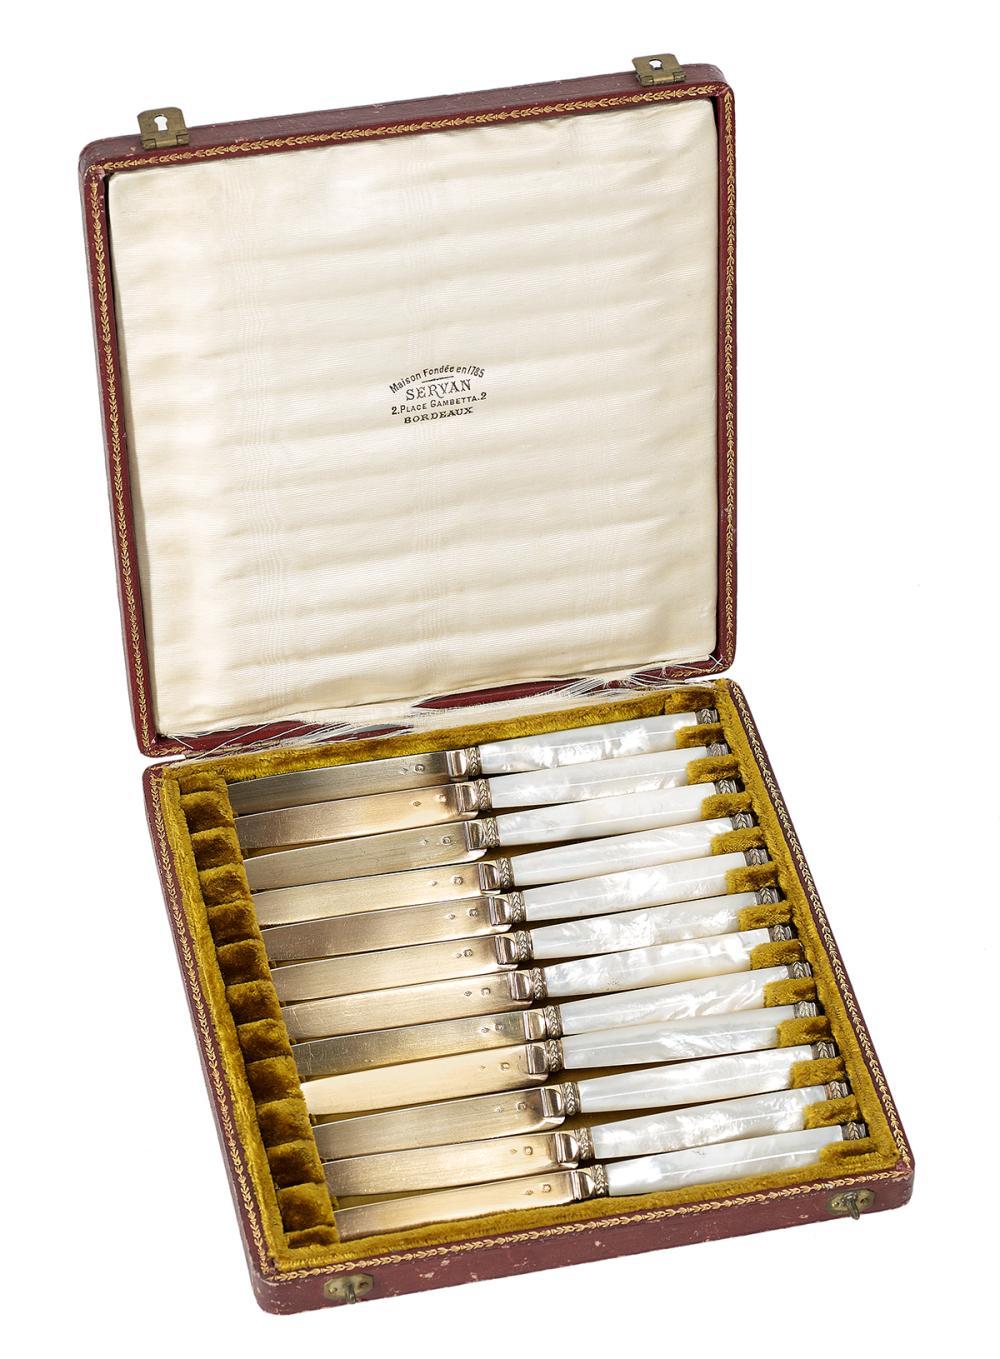 La Maison Des Deux Fées Bordeaux good cased set of french silver gilt and mother-of-pearl fru